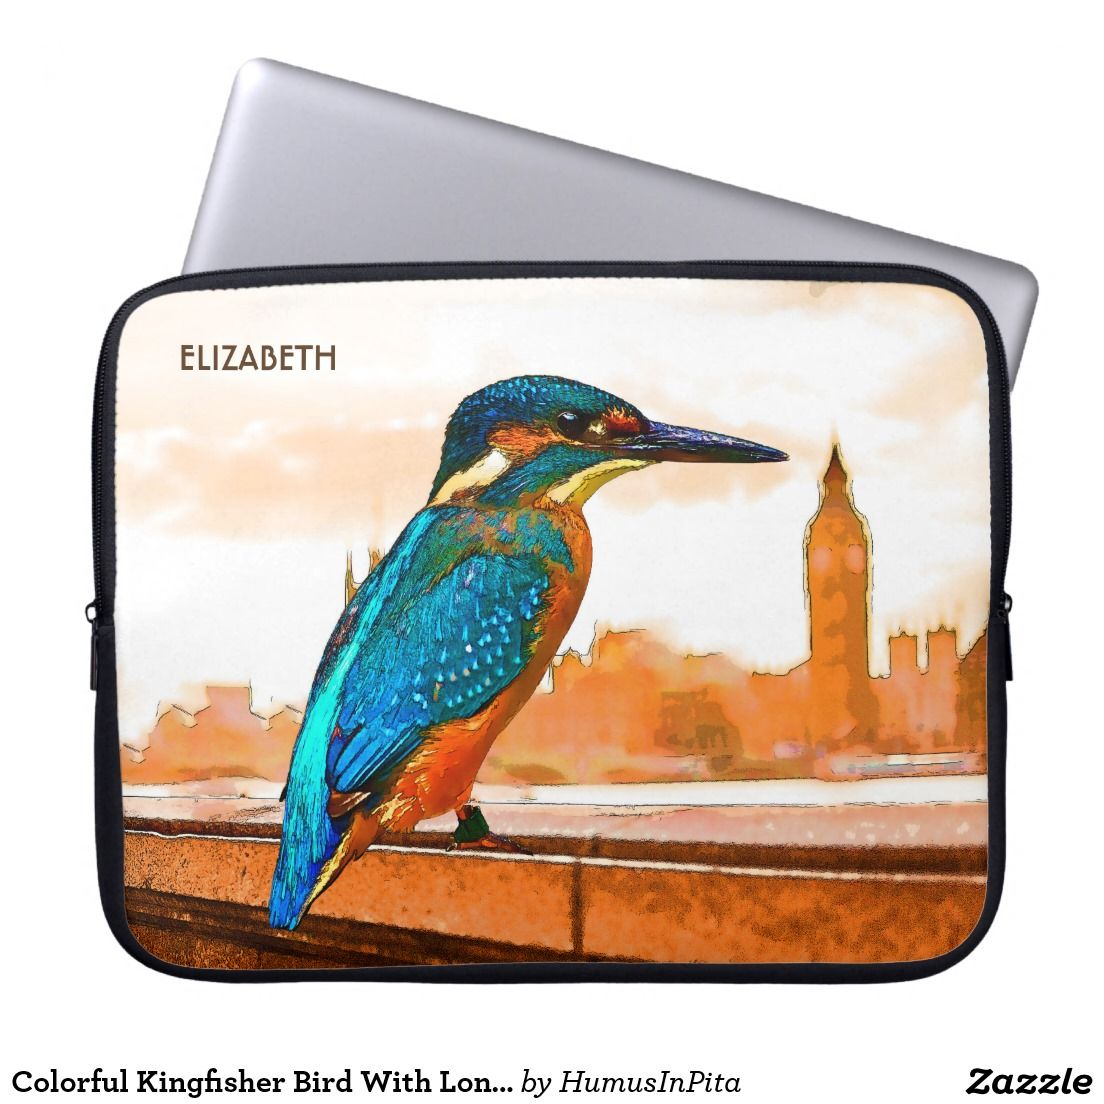 Colorful Kingfisher Bird With London Skyline Laptop Sleeve